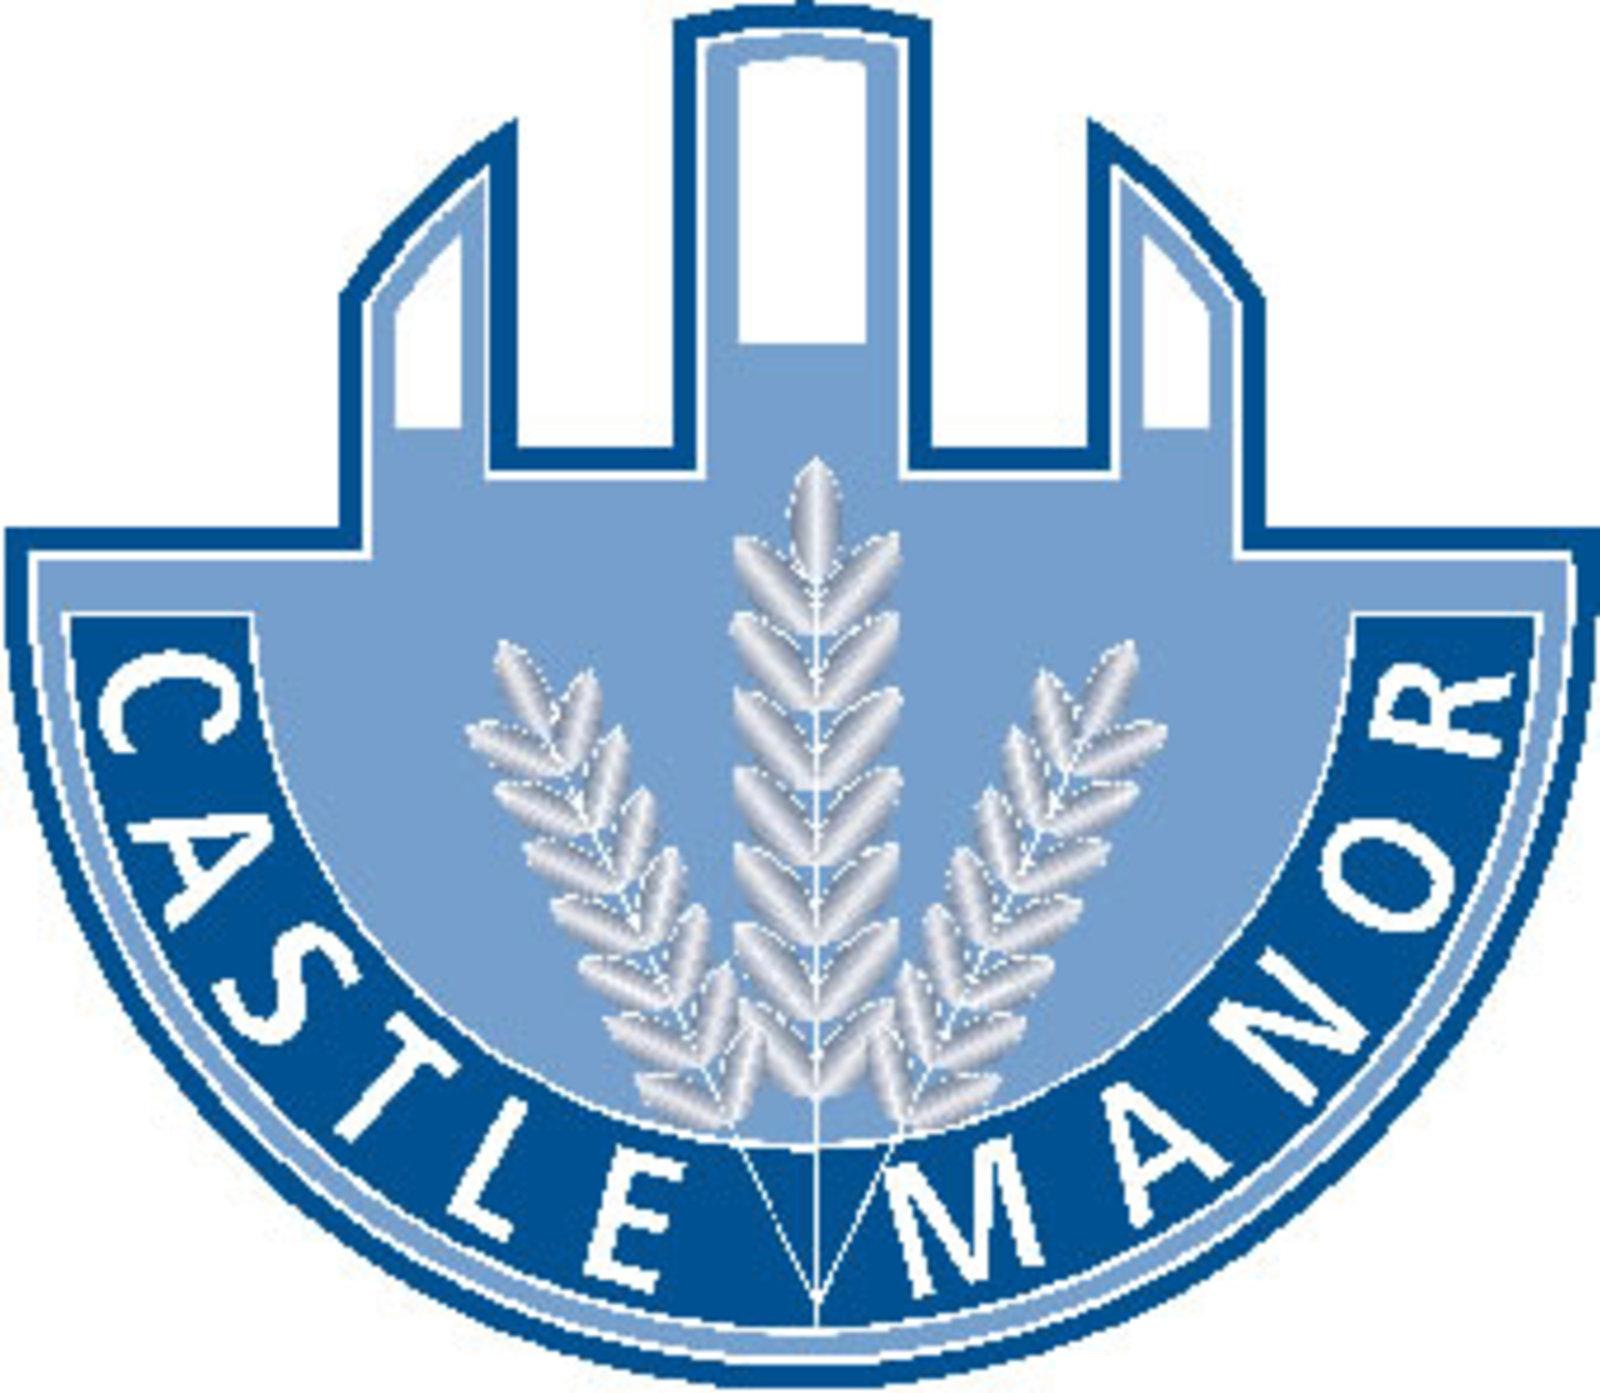 Castle manor logo jpeg